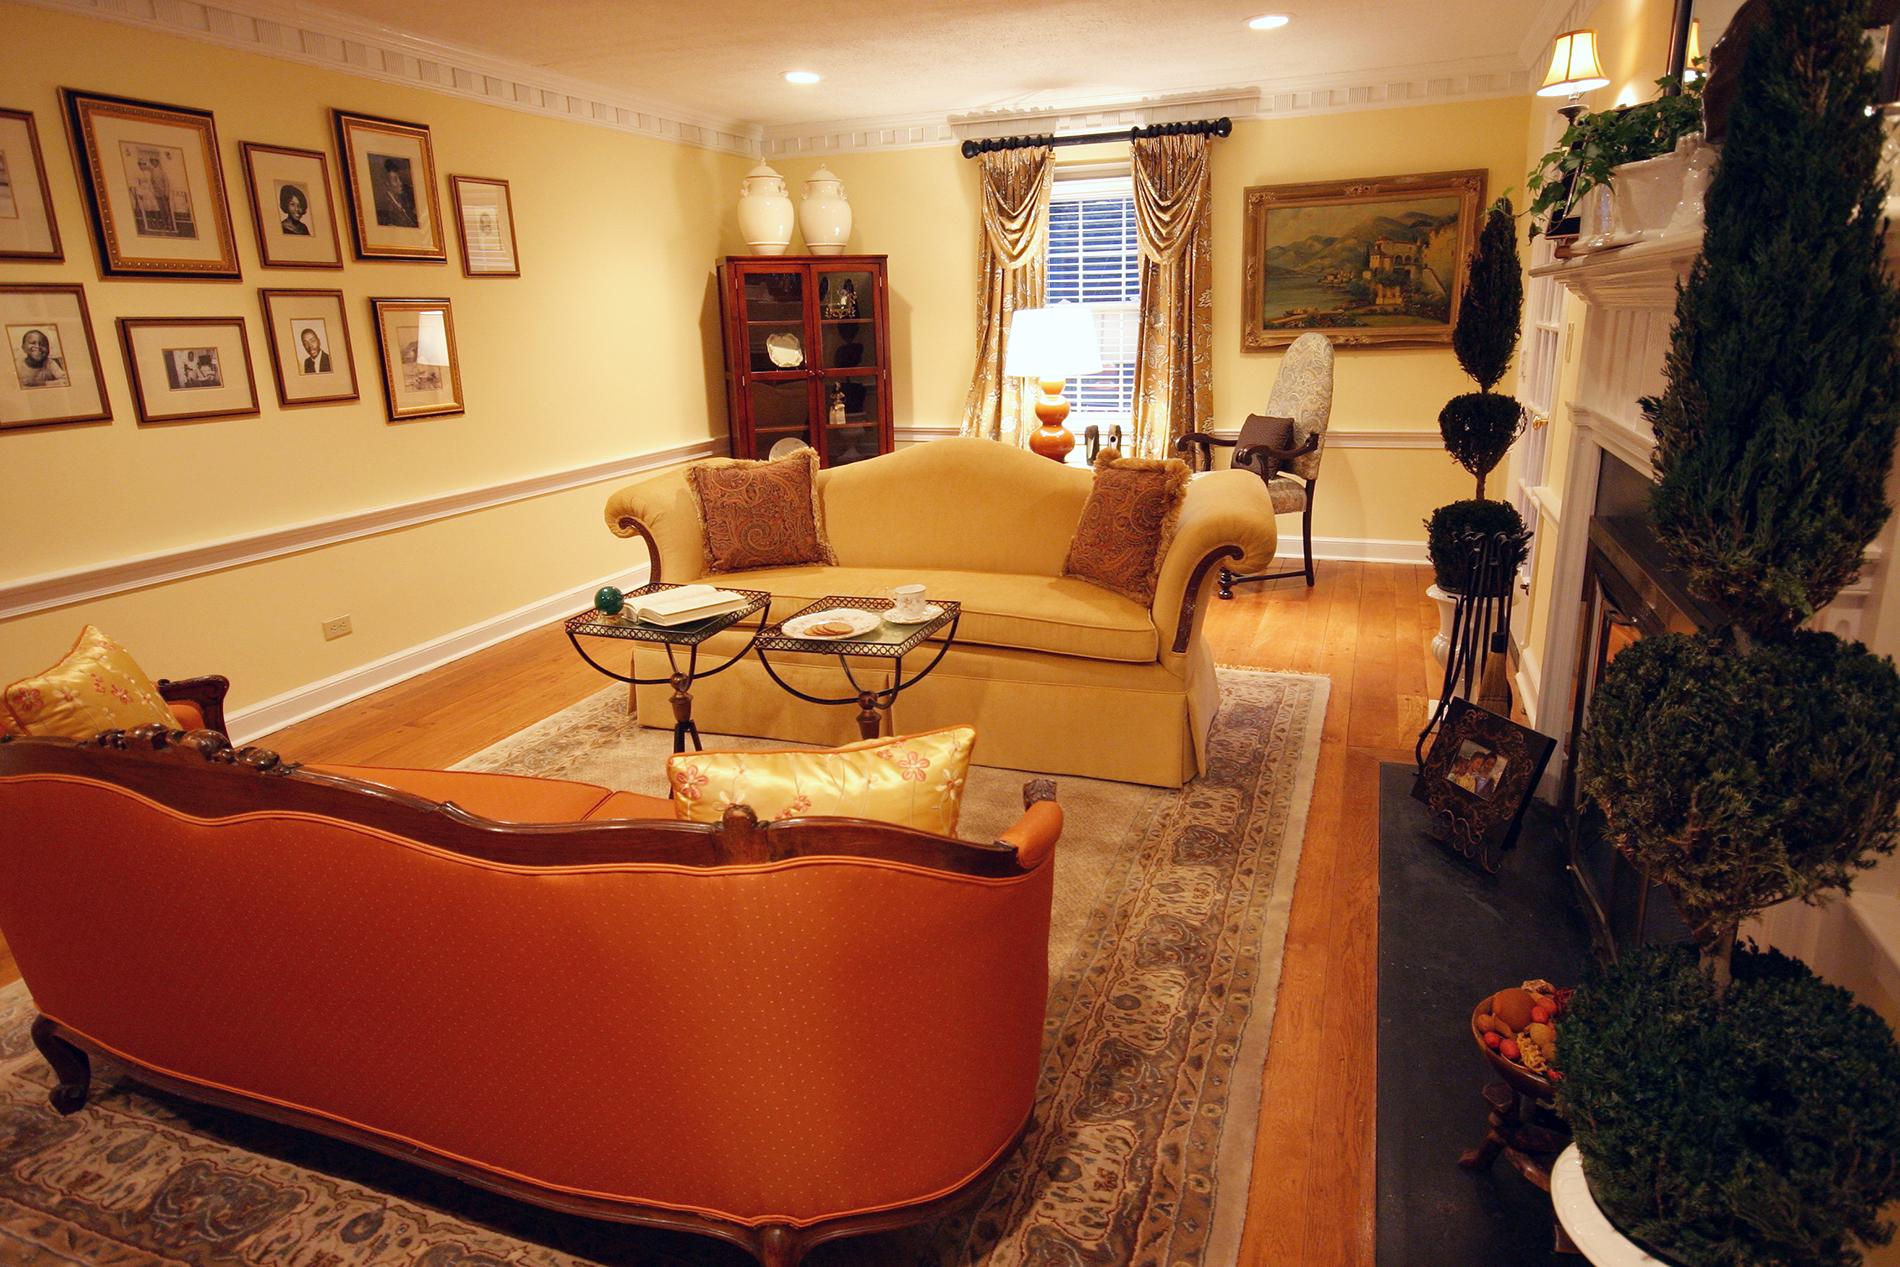 Antique Inspired Living Room Re-design After A WEB.jpg